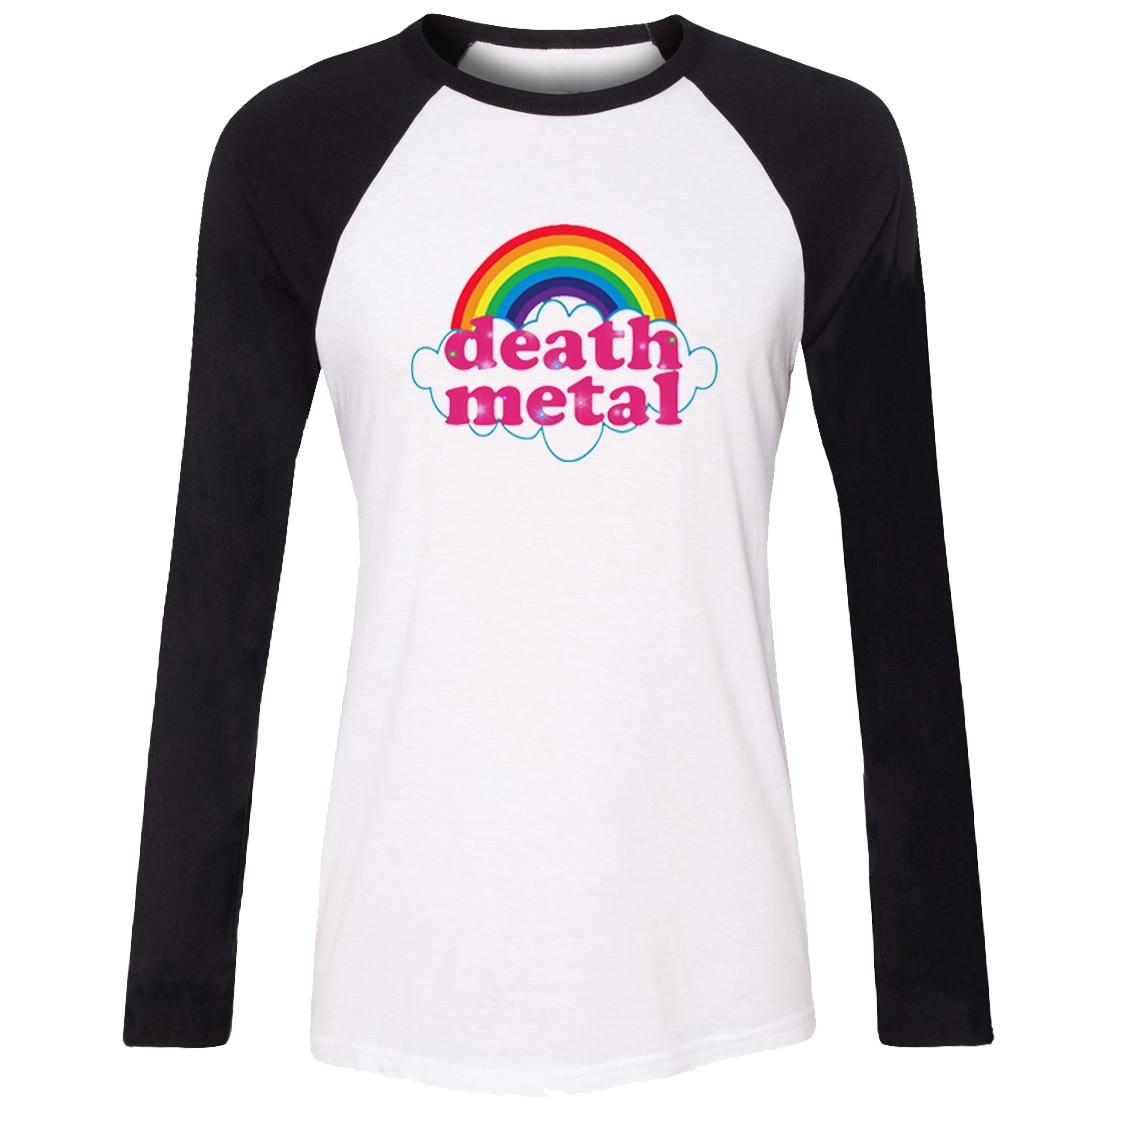 281981b975e iDzn New Women s Casual T shirt Death metal music heavy unicorn rainbow  Pattern Raglan Long Sleeve Girl s T shirt Lady Tee Tops-in T-Shirts from  Women s ...